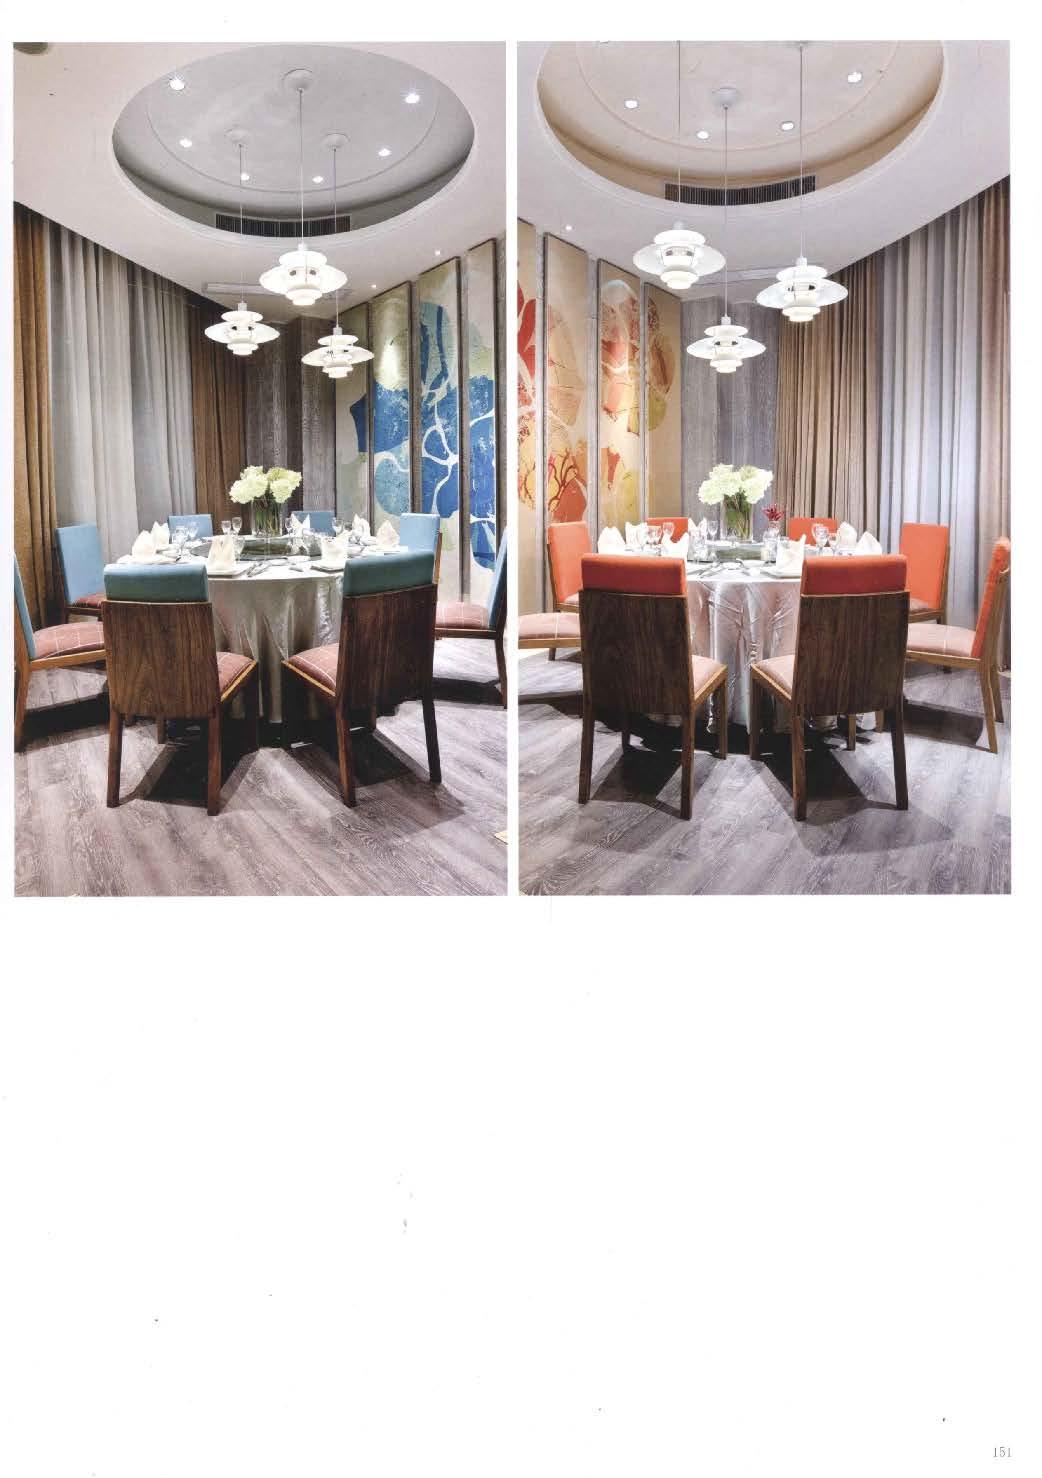 H073 东方风情 会所、餐饮细部解析_Page_149.jpg